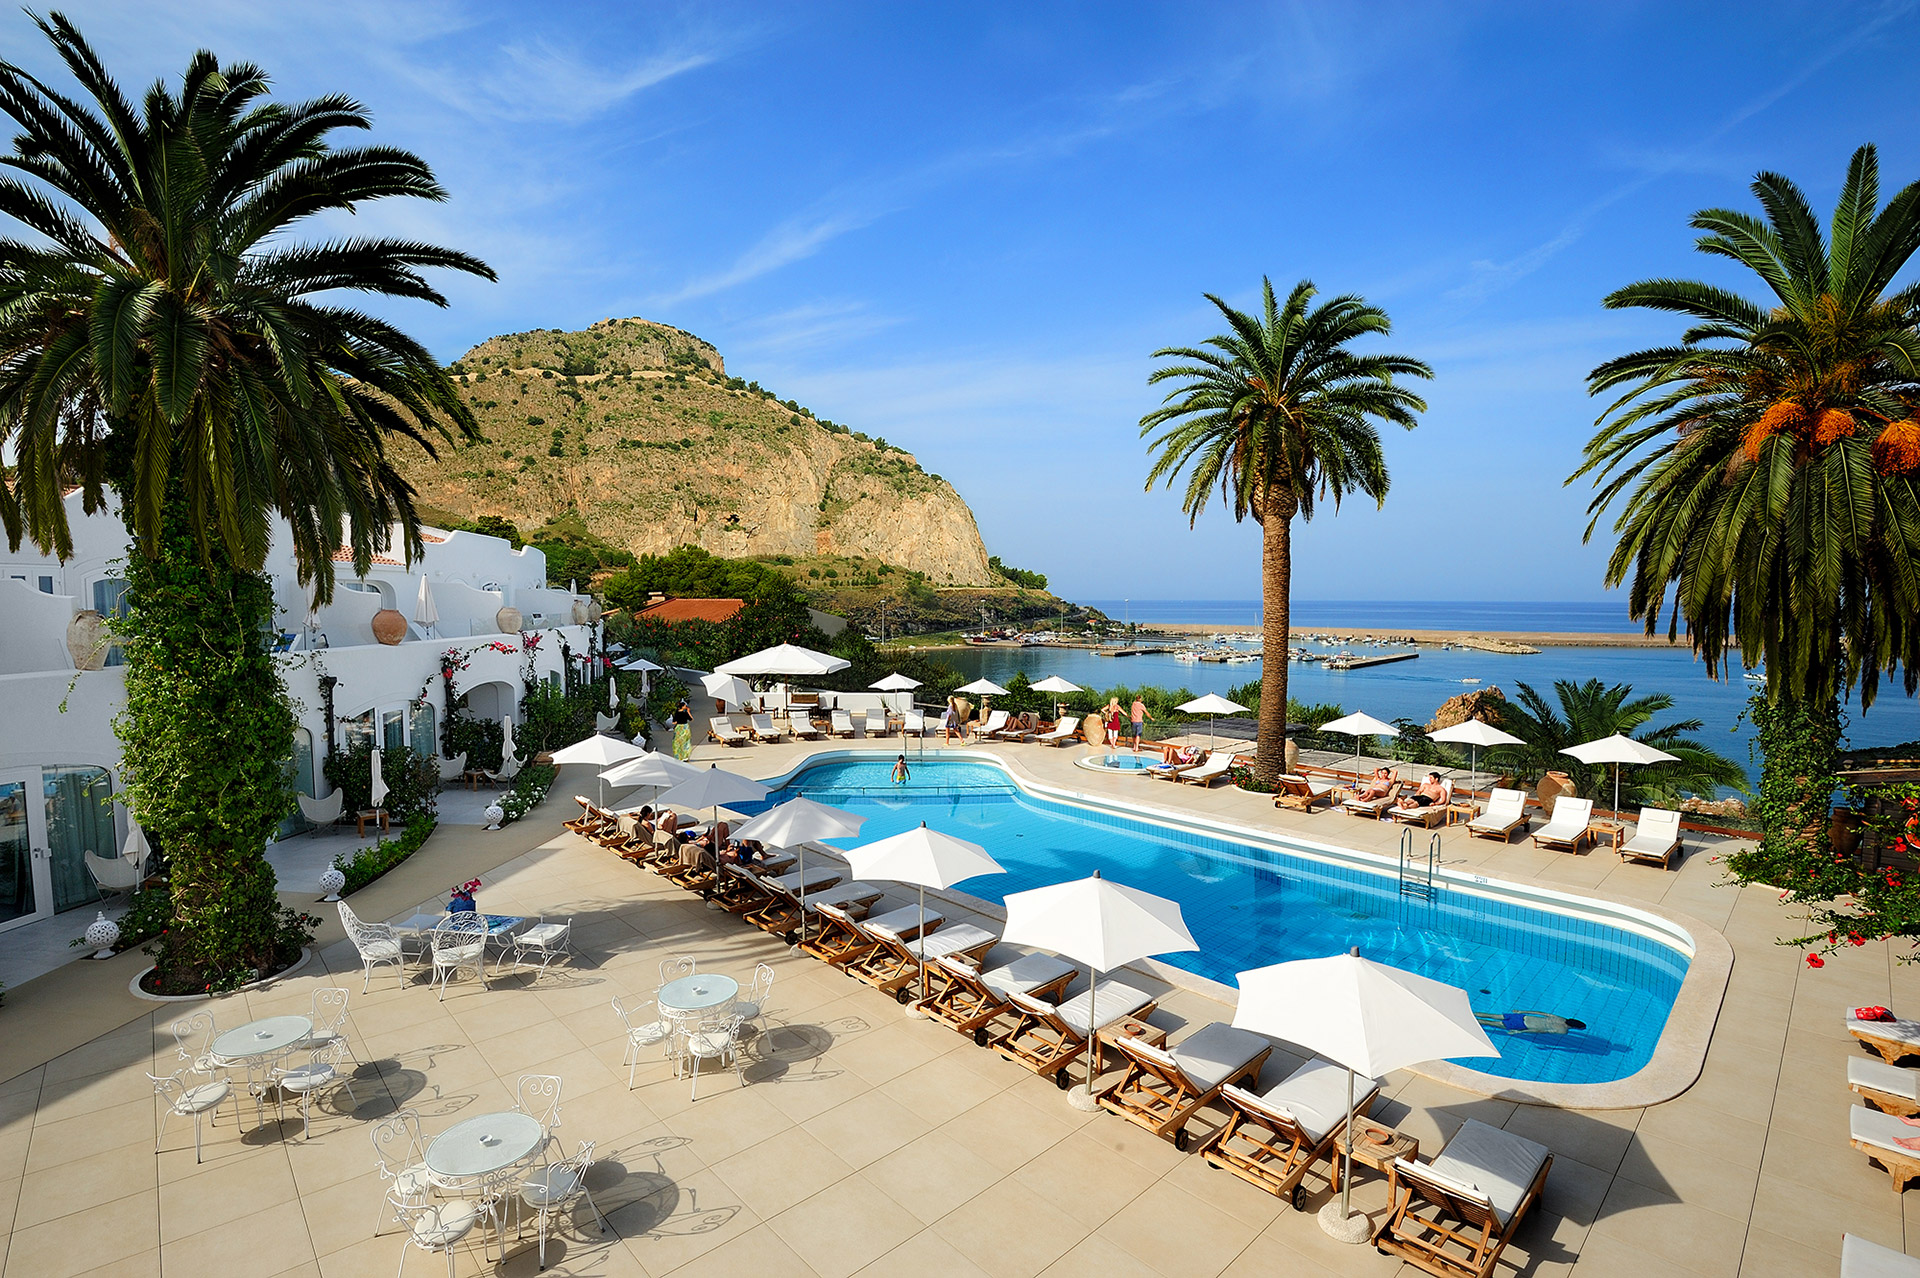 Hotel Le Calette Cefalu It Visit Sicily